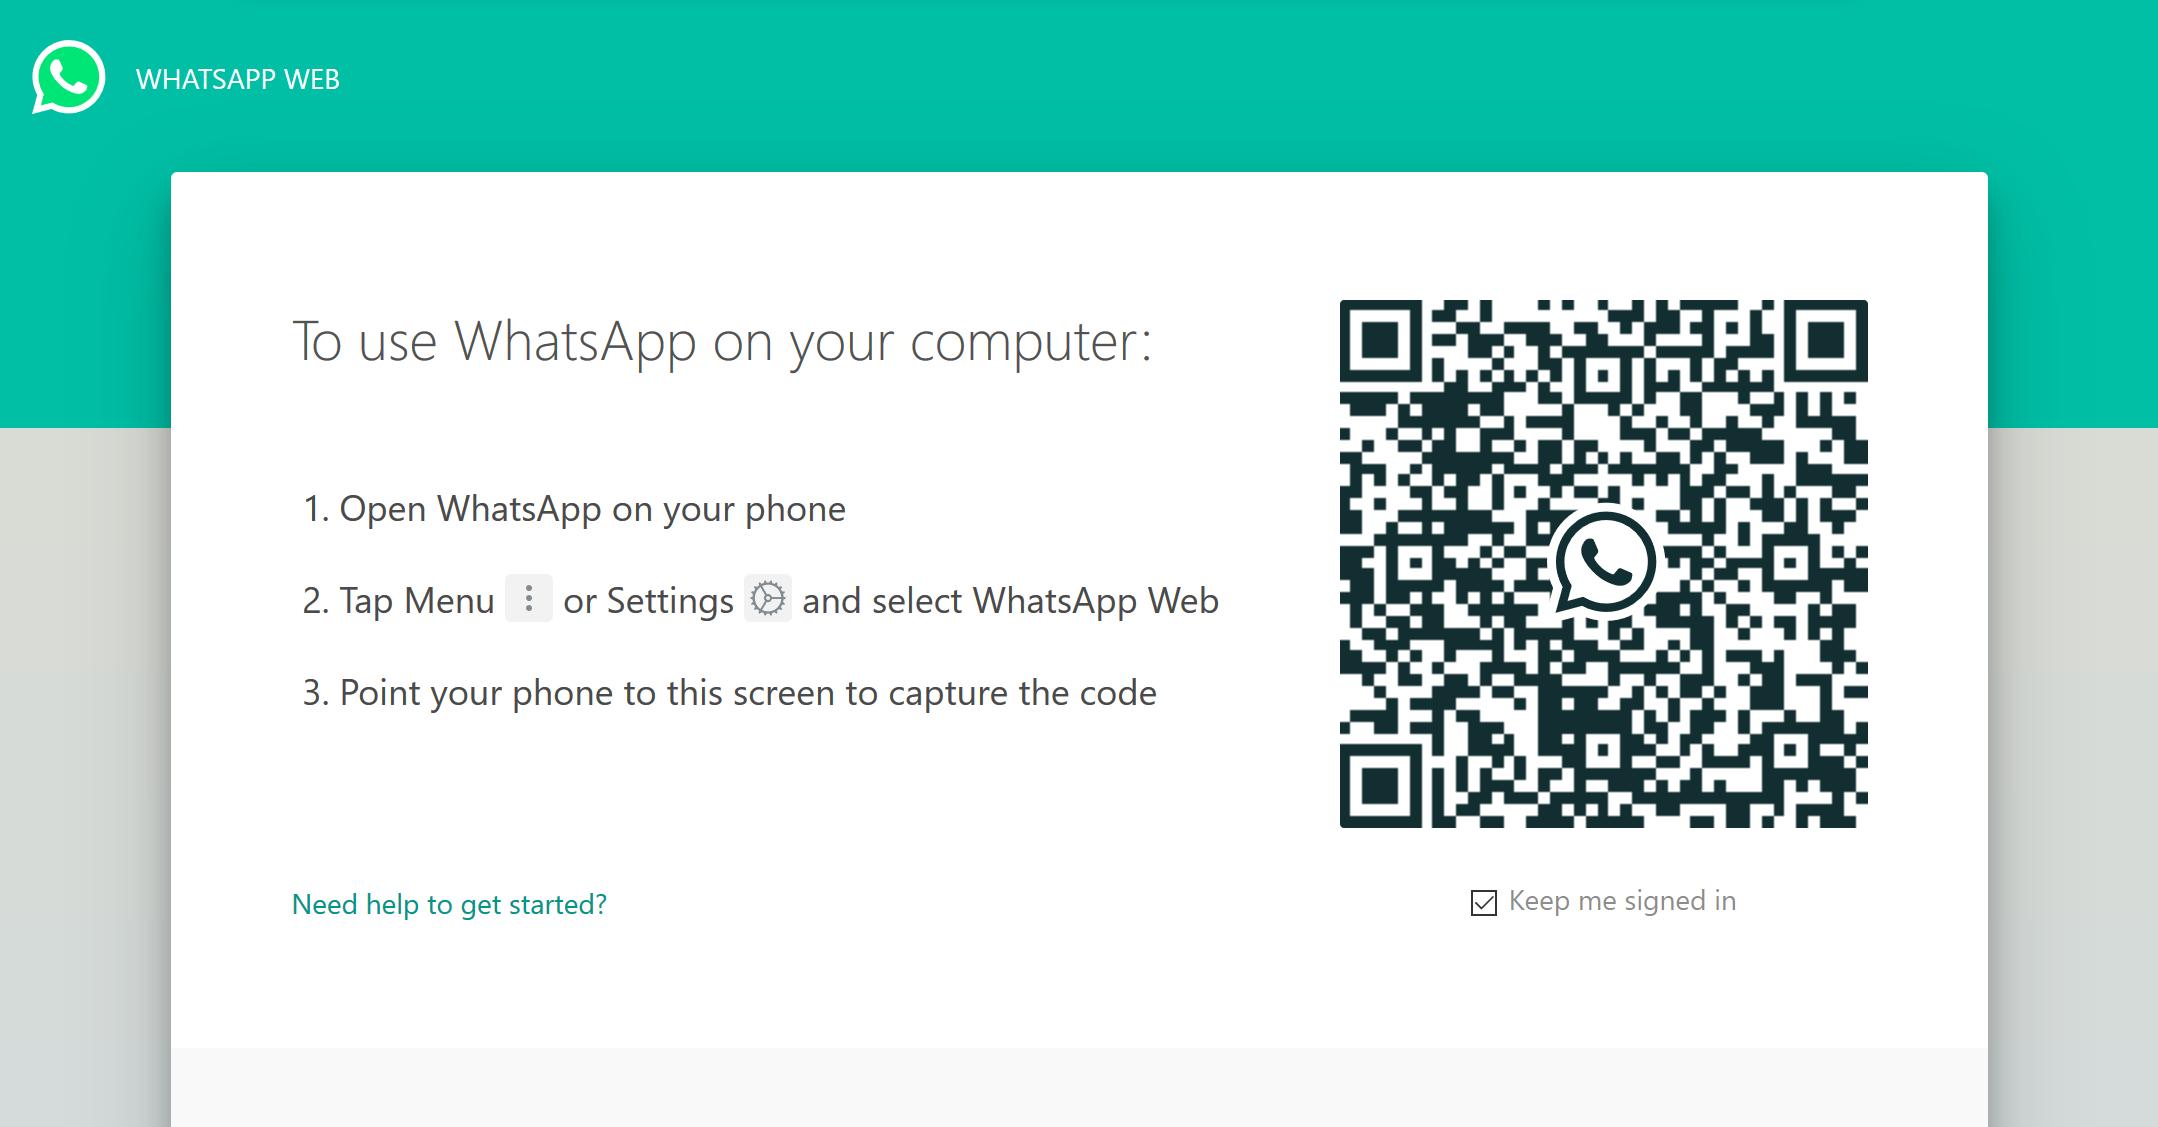 Using WhatsApp Web